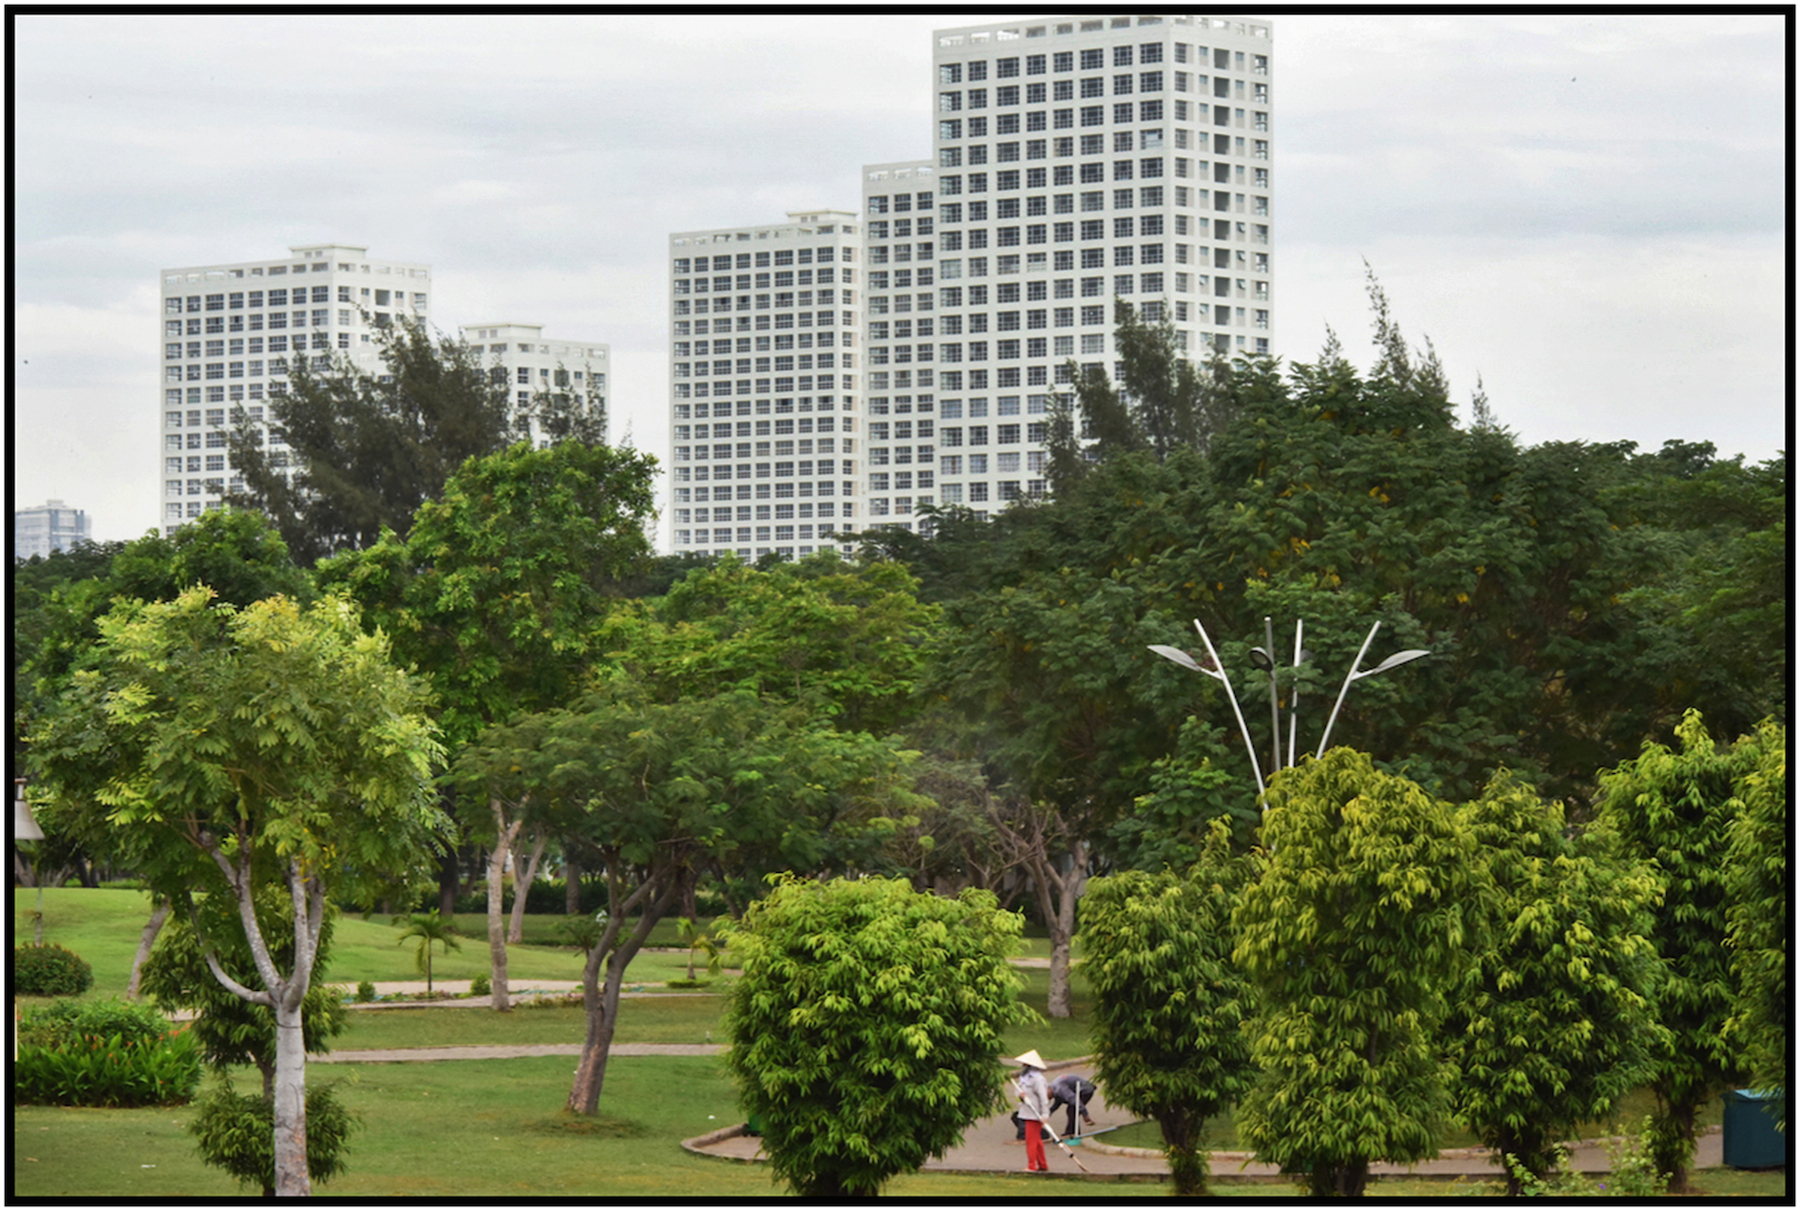 Phu My Hung, luxury condo development, Saigon/HCMC, Dec. 2015. #4796